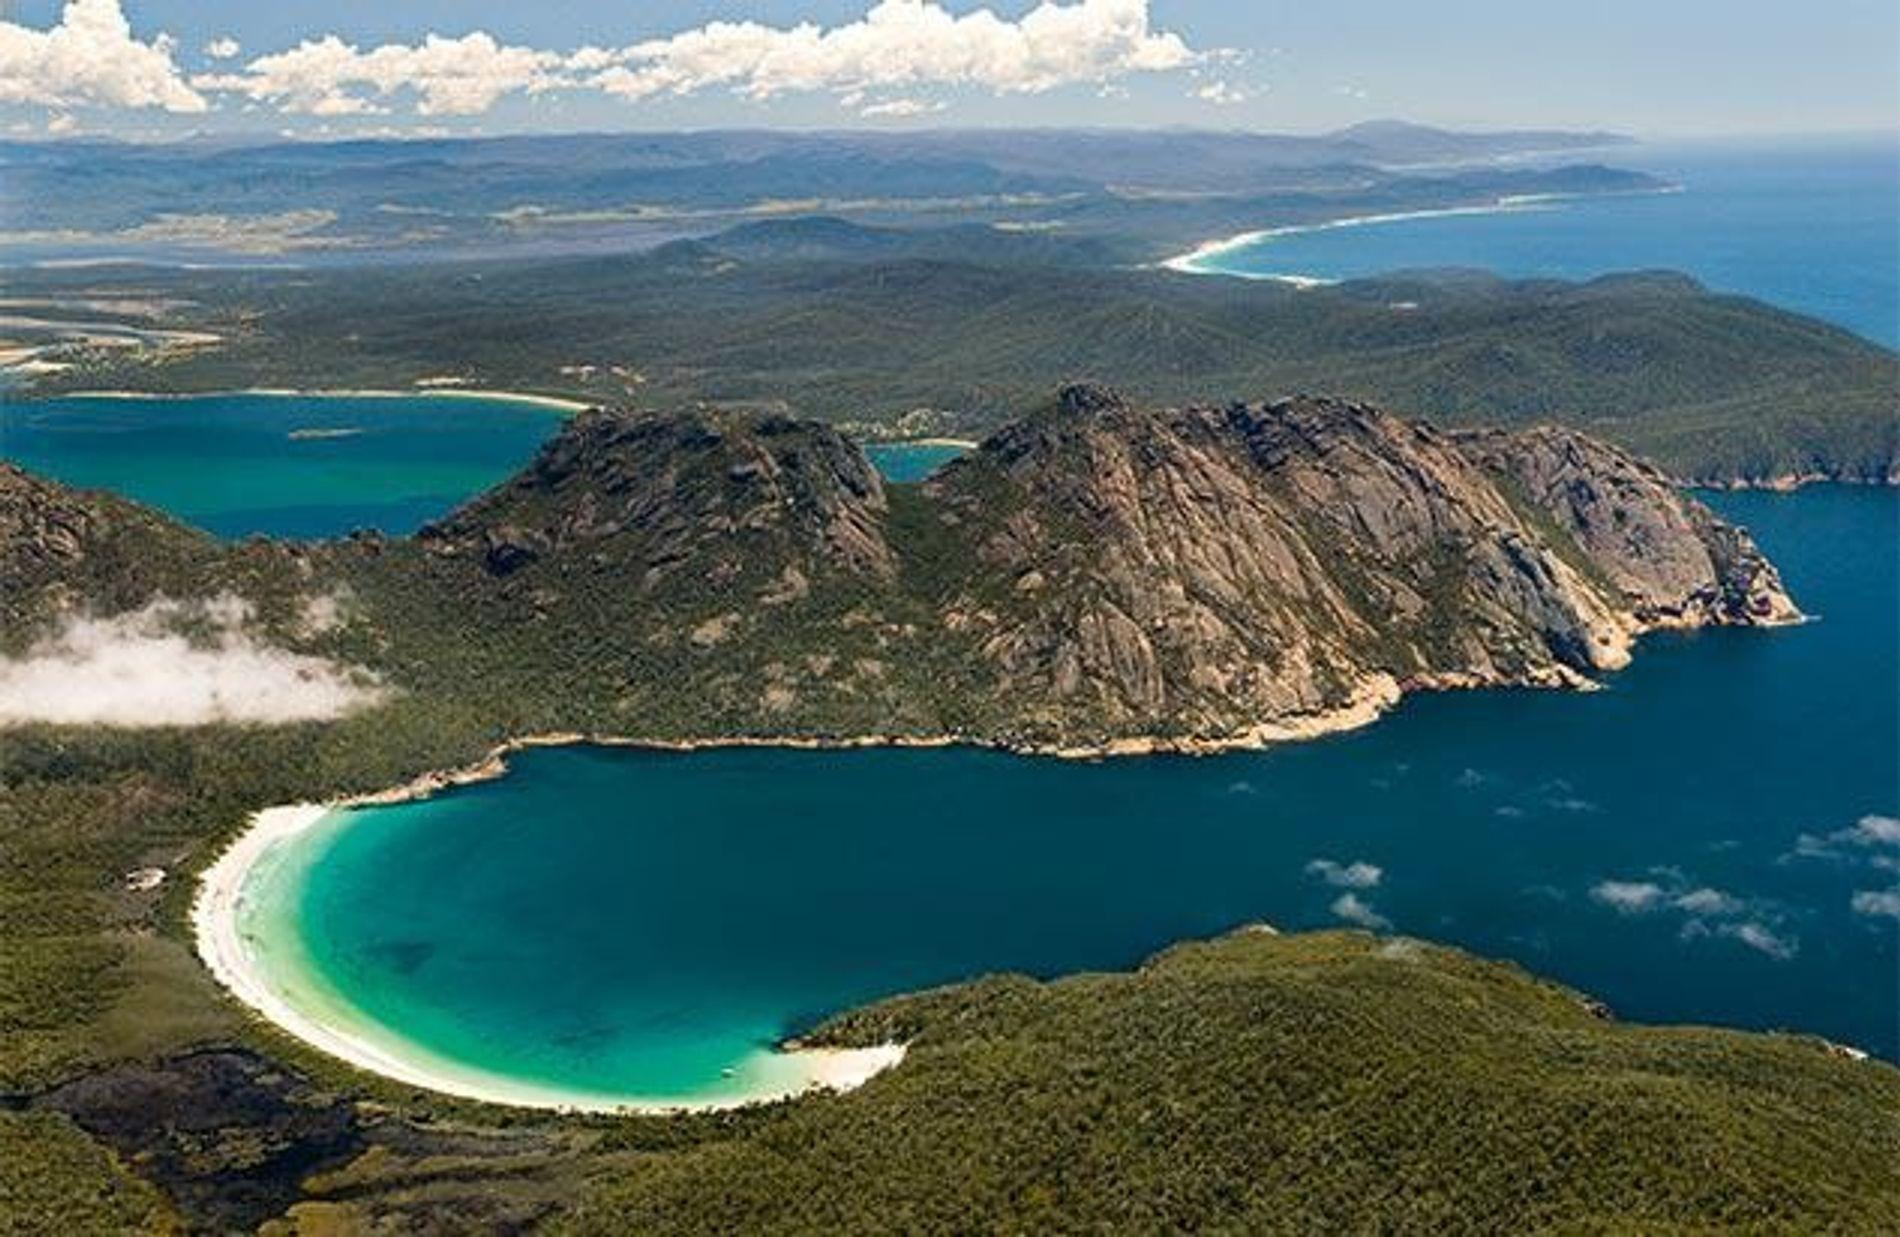 Tasmanien: Australiens grünes Juwel